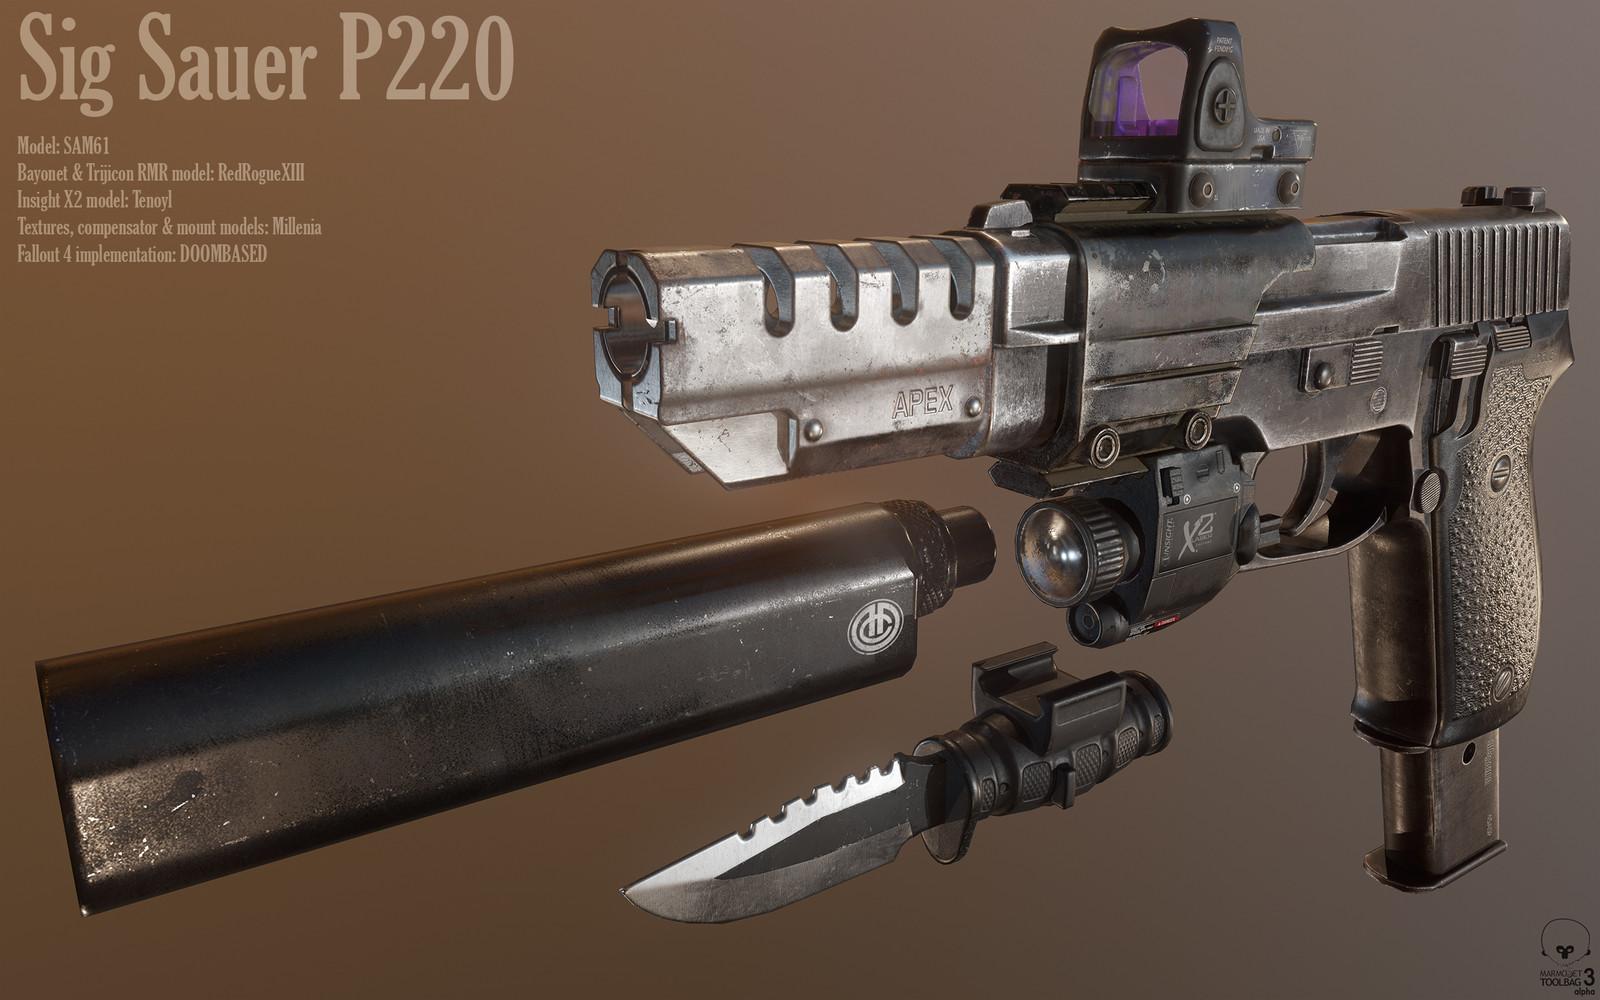 ArtStation - Sig Sauer P220 for Fallout 4, Hans Palm